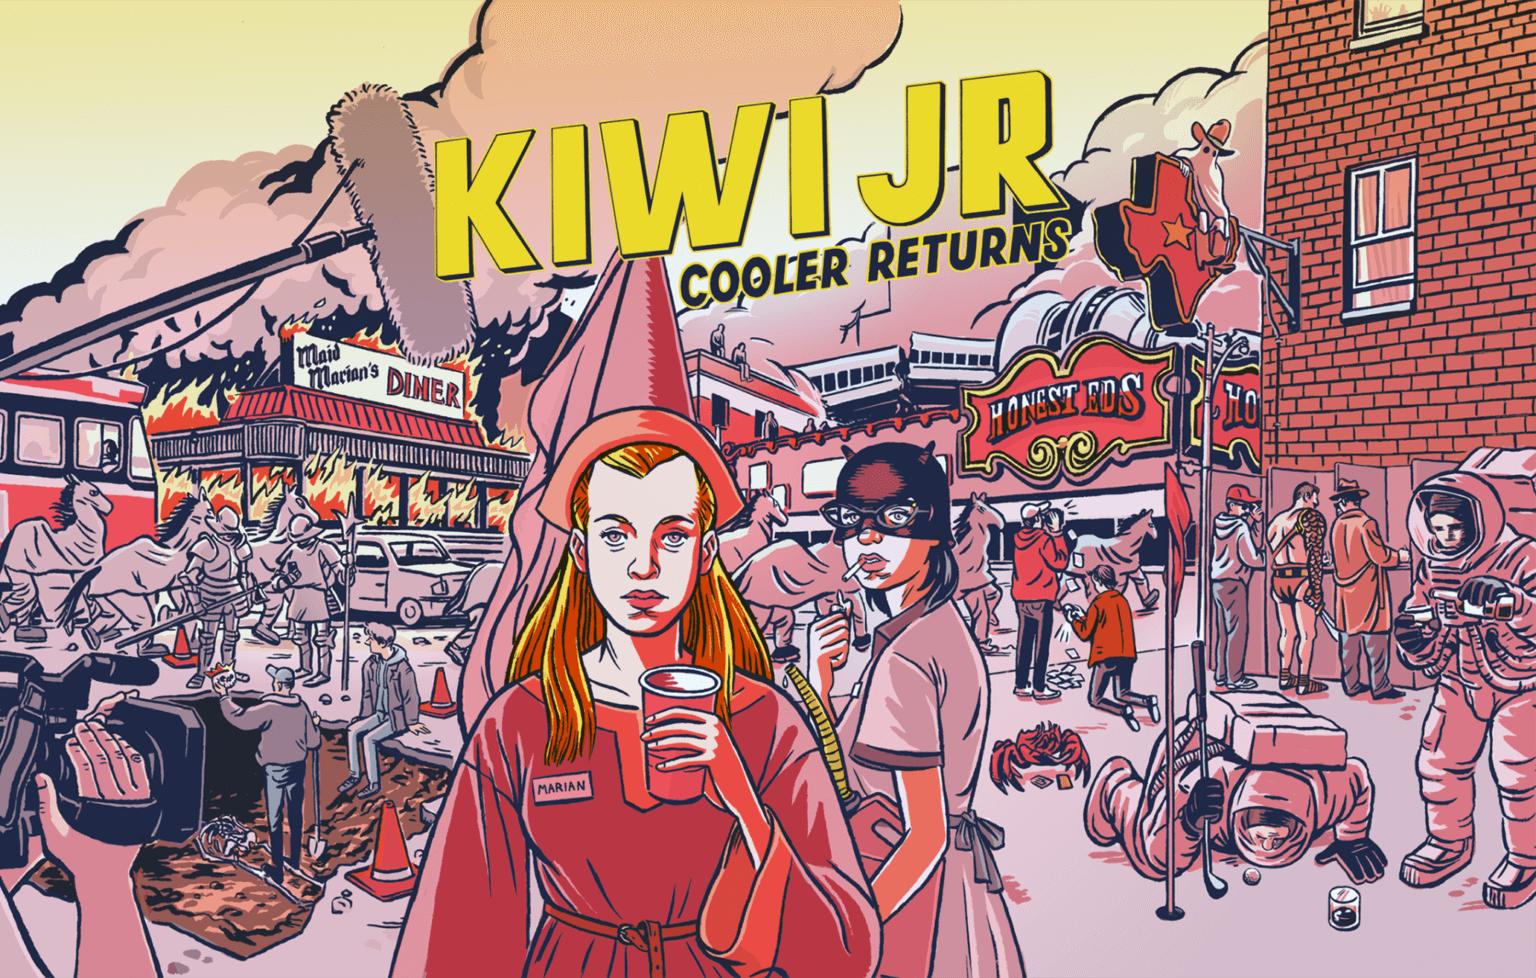 Kiwi Jr. has partnered with cartoonist Dmitry Bondarenko on a 24-page booklet of illustrated lyrics